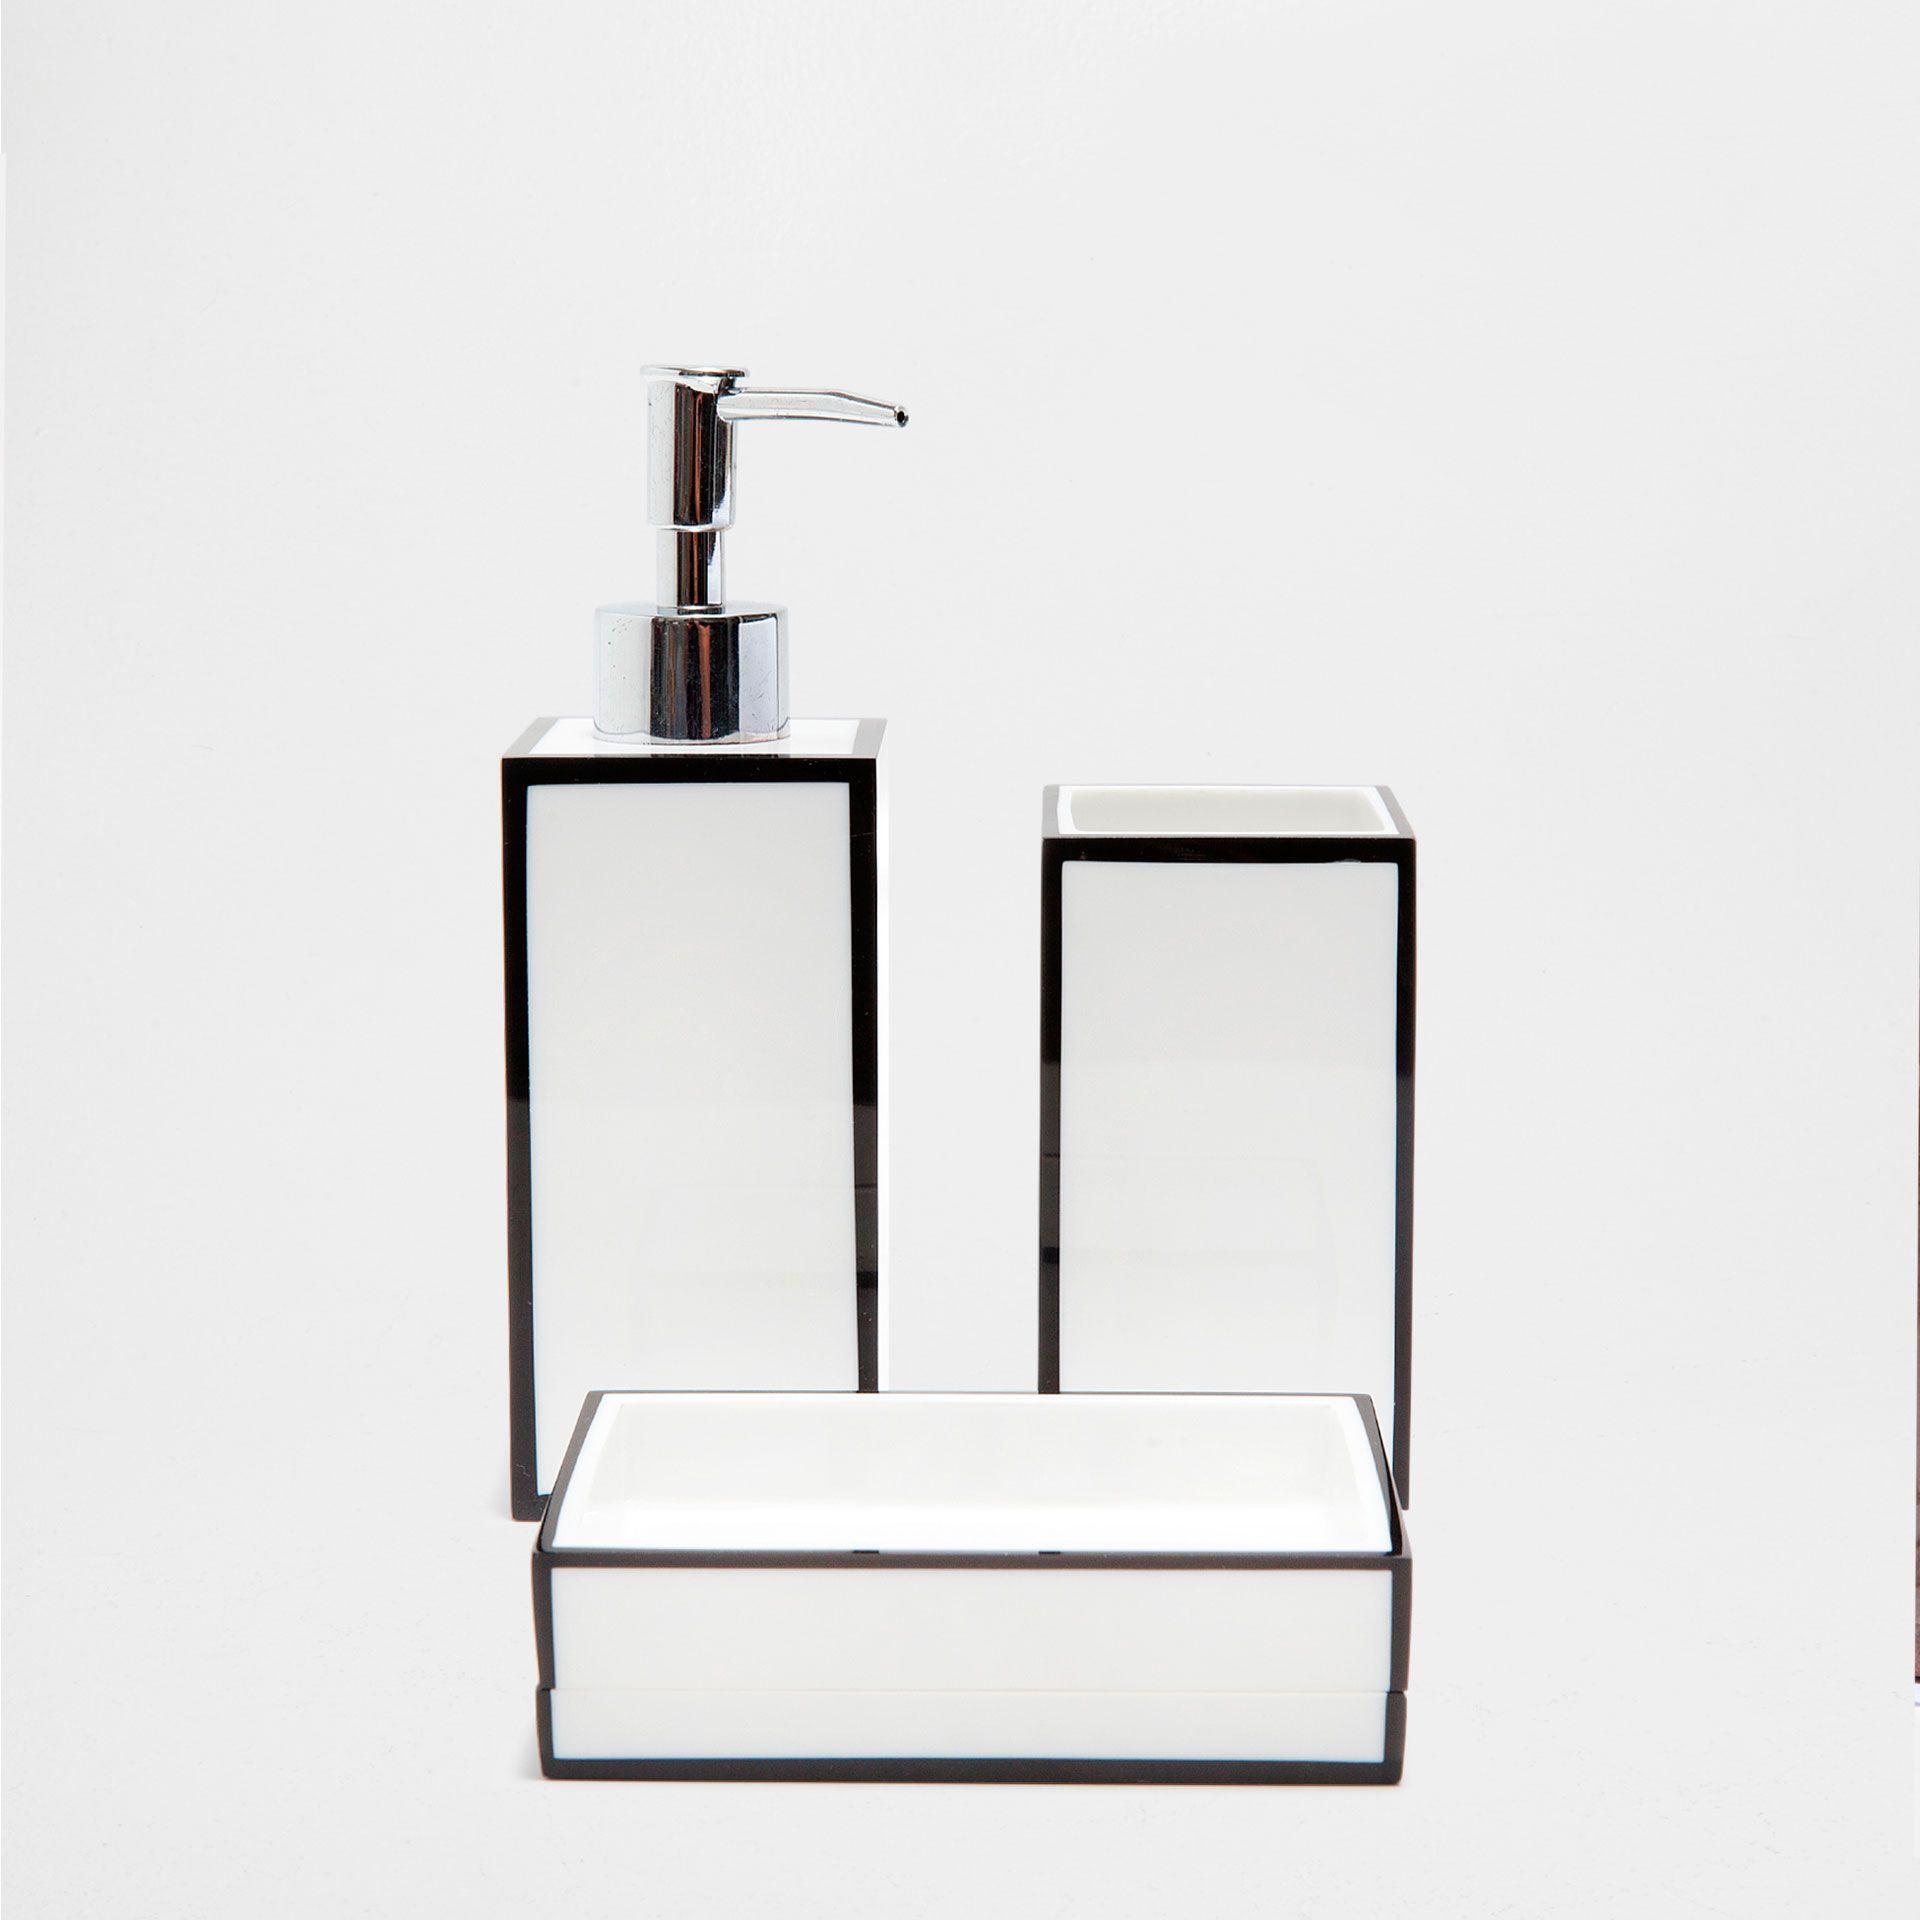 BLACK AND WHITE BATHROOM SET | bathroom accessories set | Pinterest ...